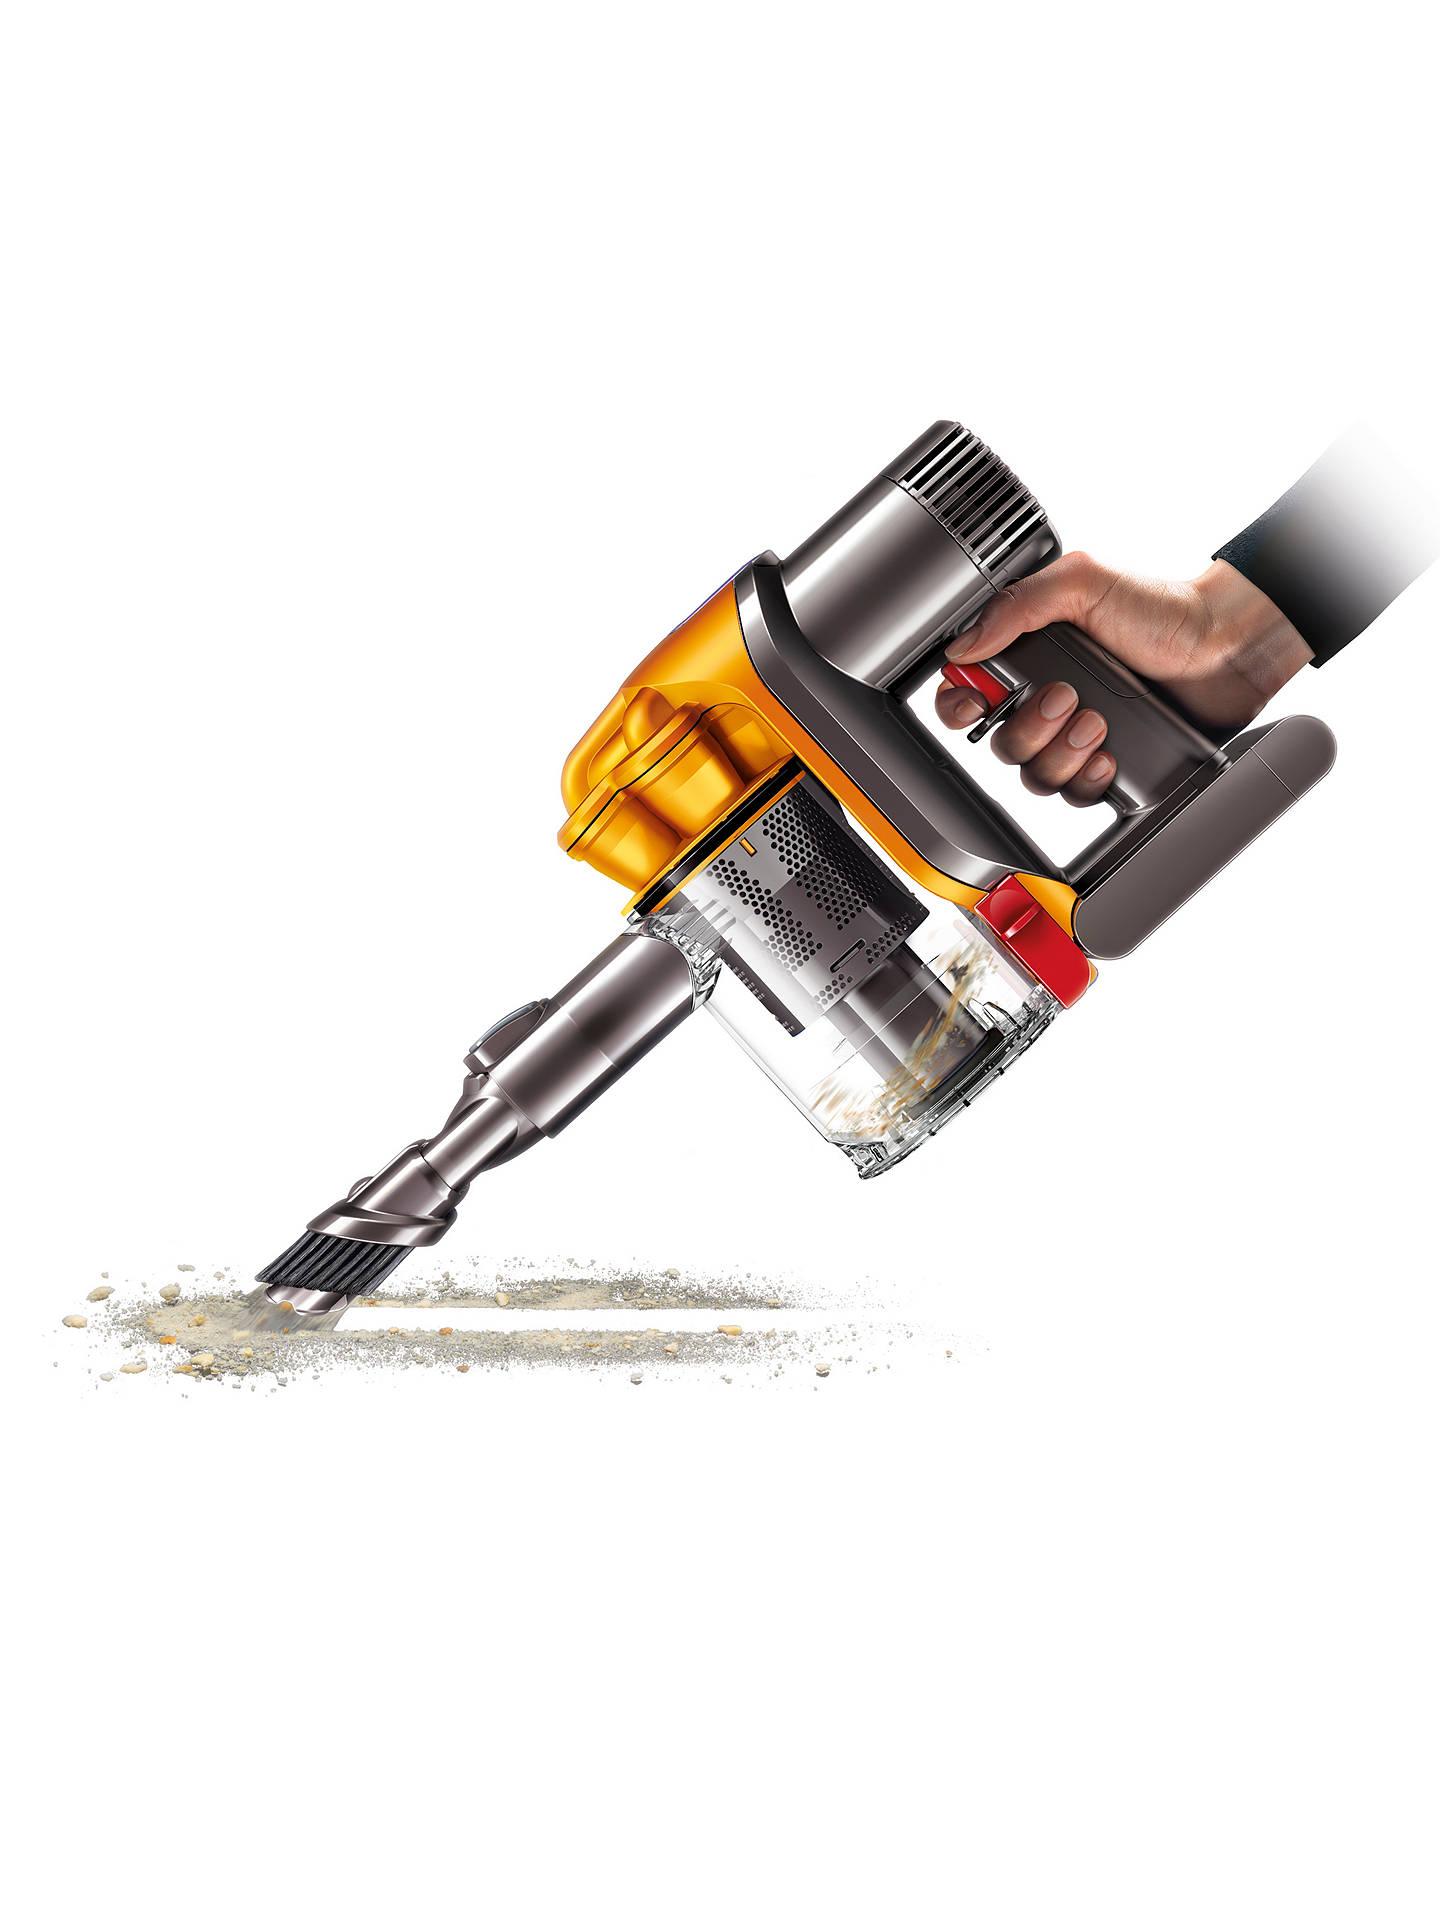 Dyson Dc34 Handheld Vacuum Cleaner Yellow At John Lewis